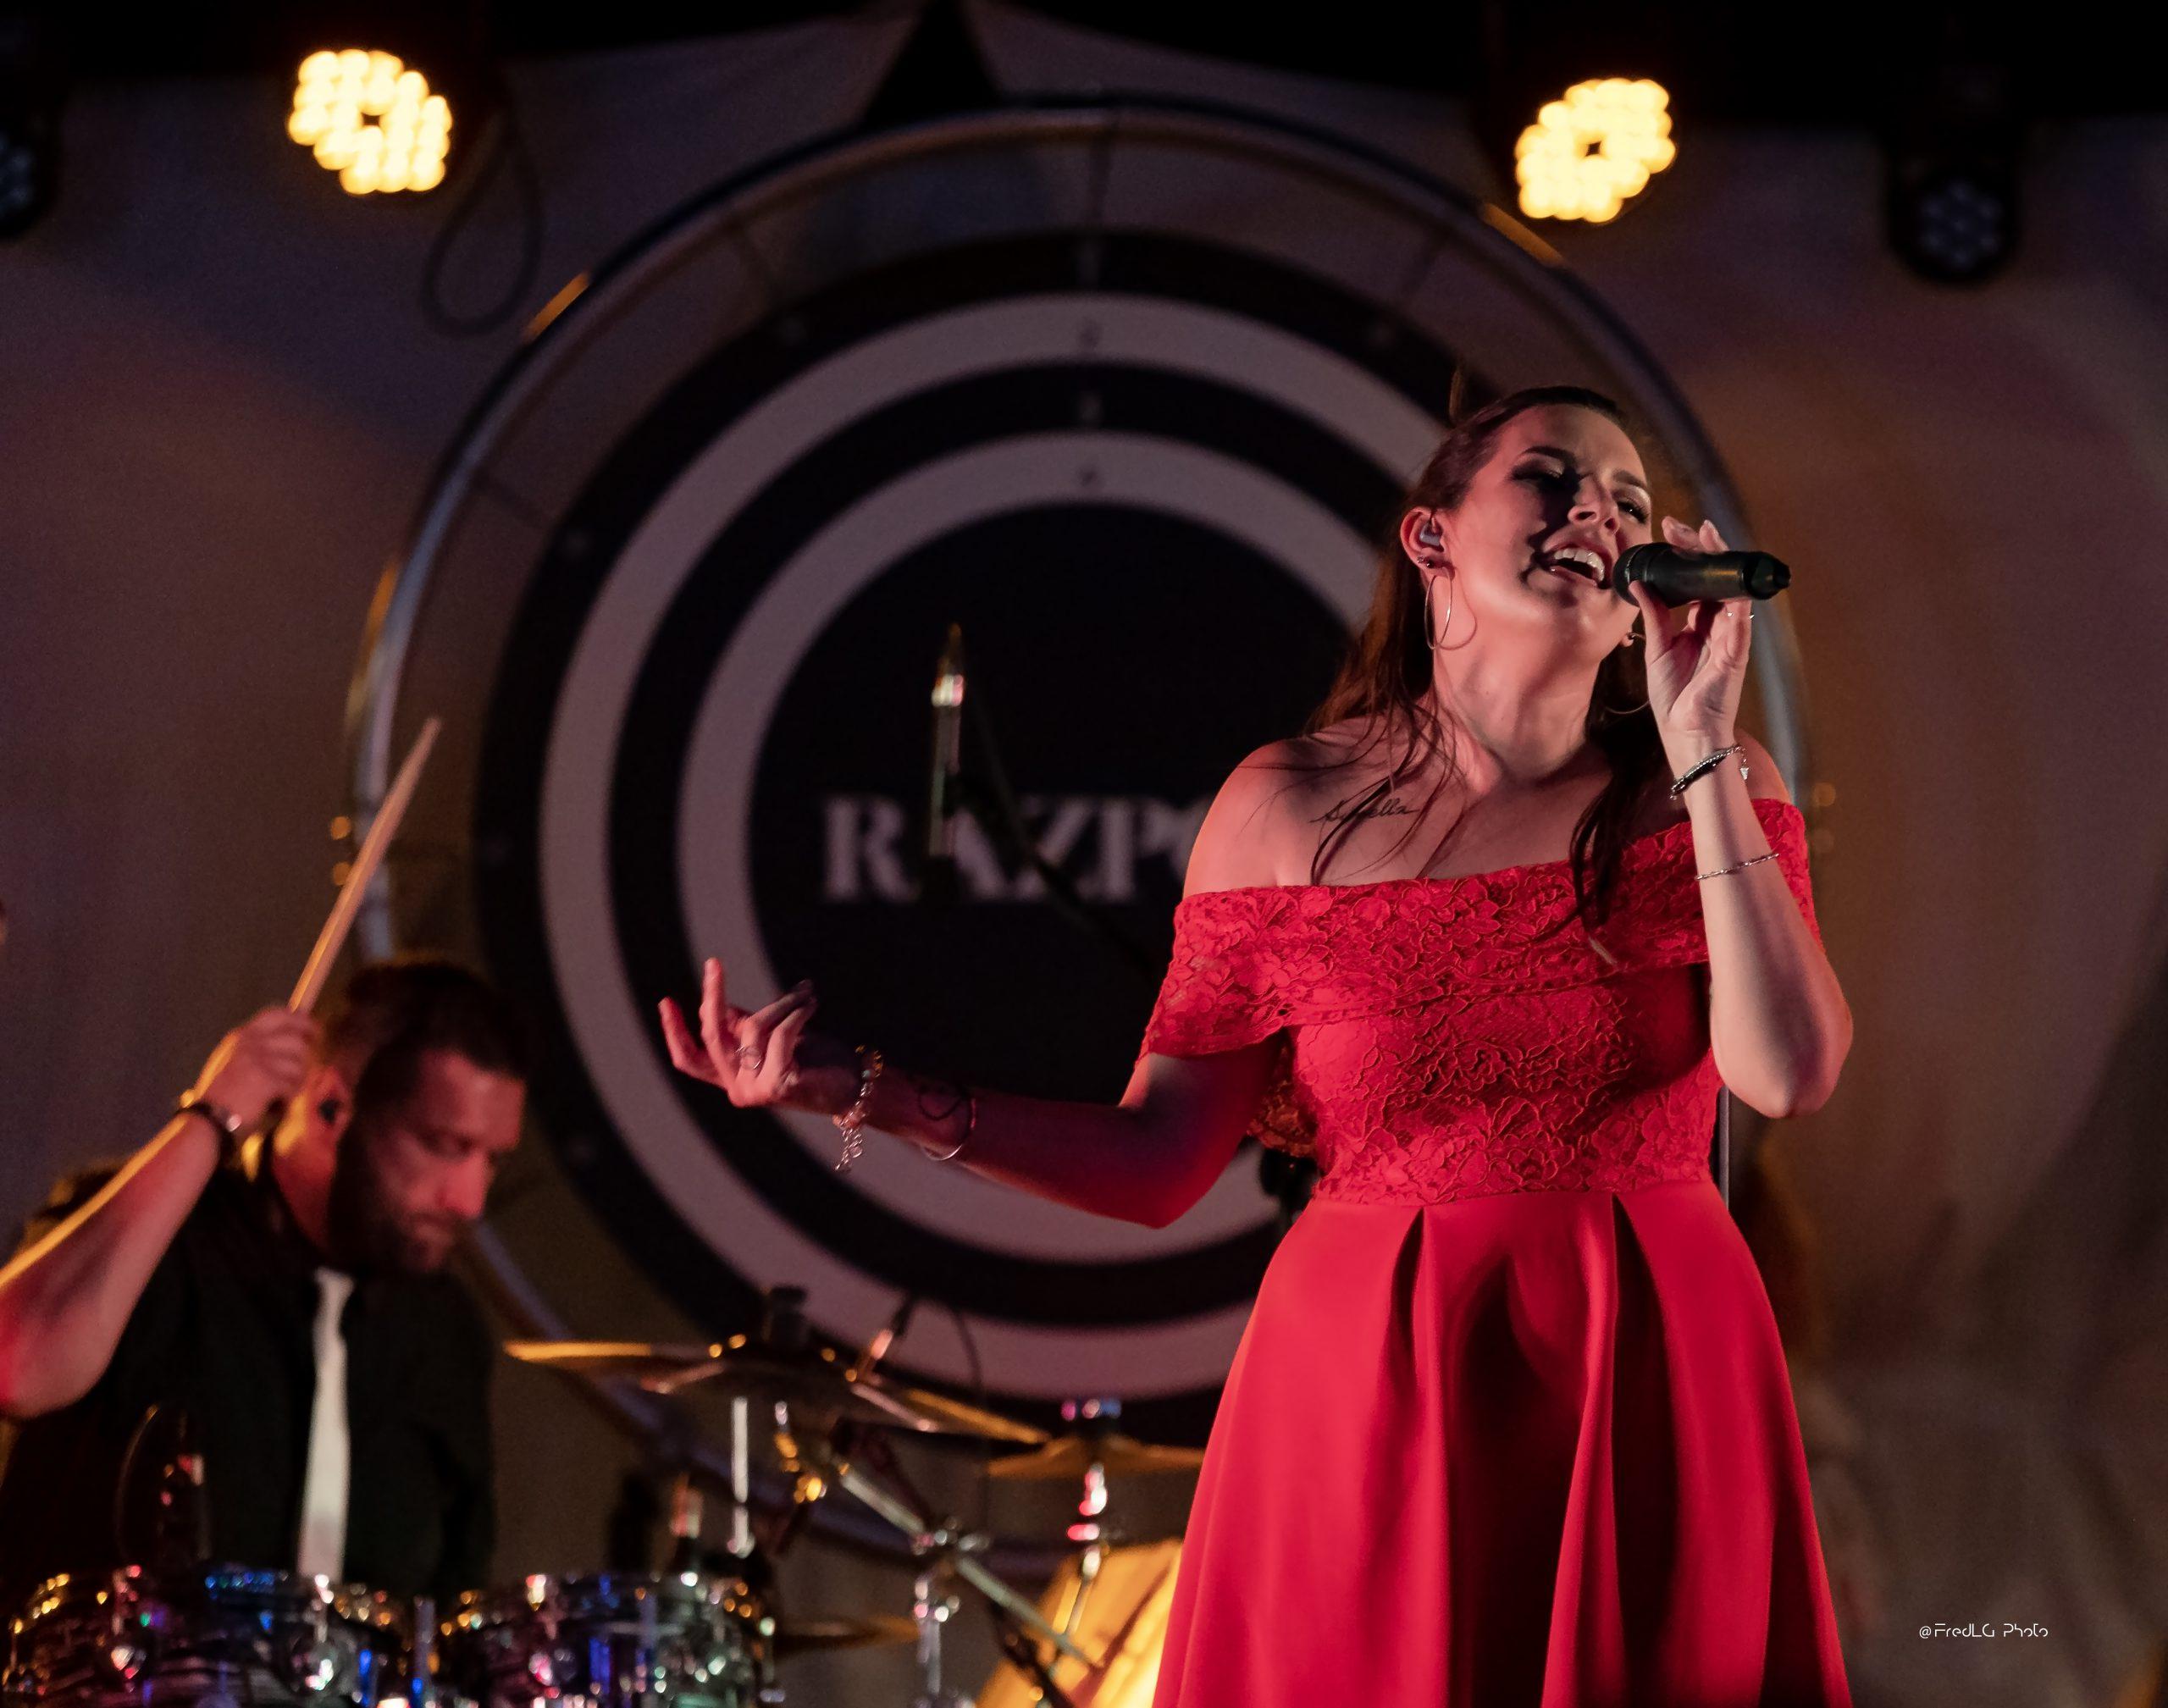 Razpop - 2019 Alex